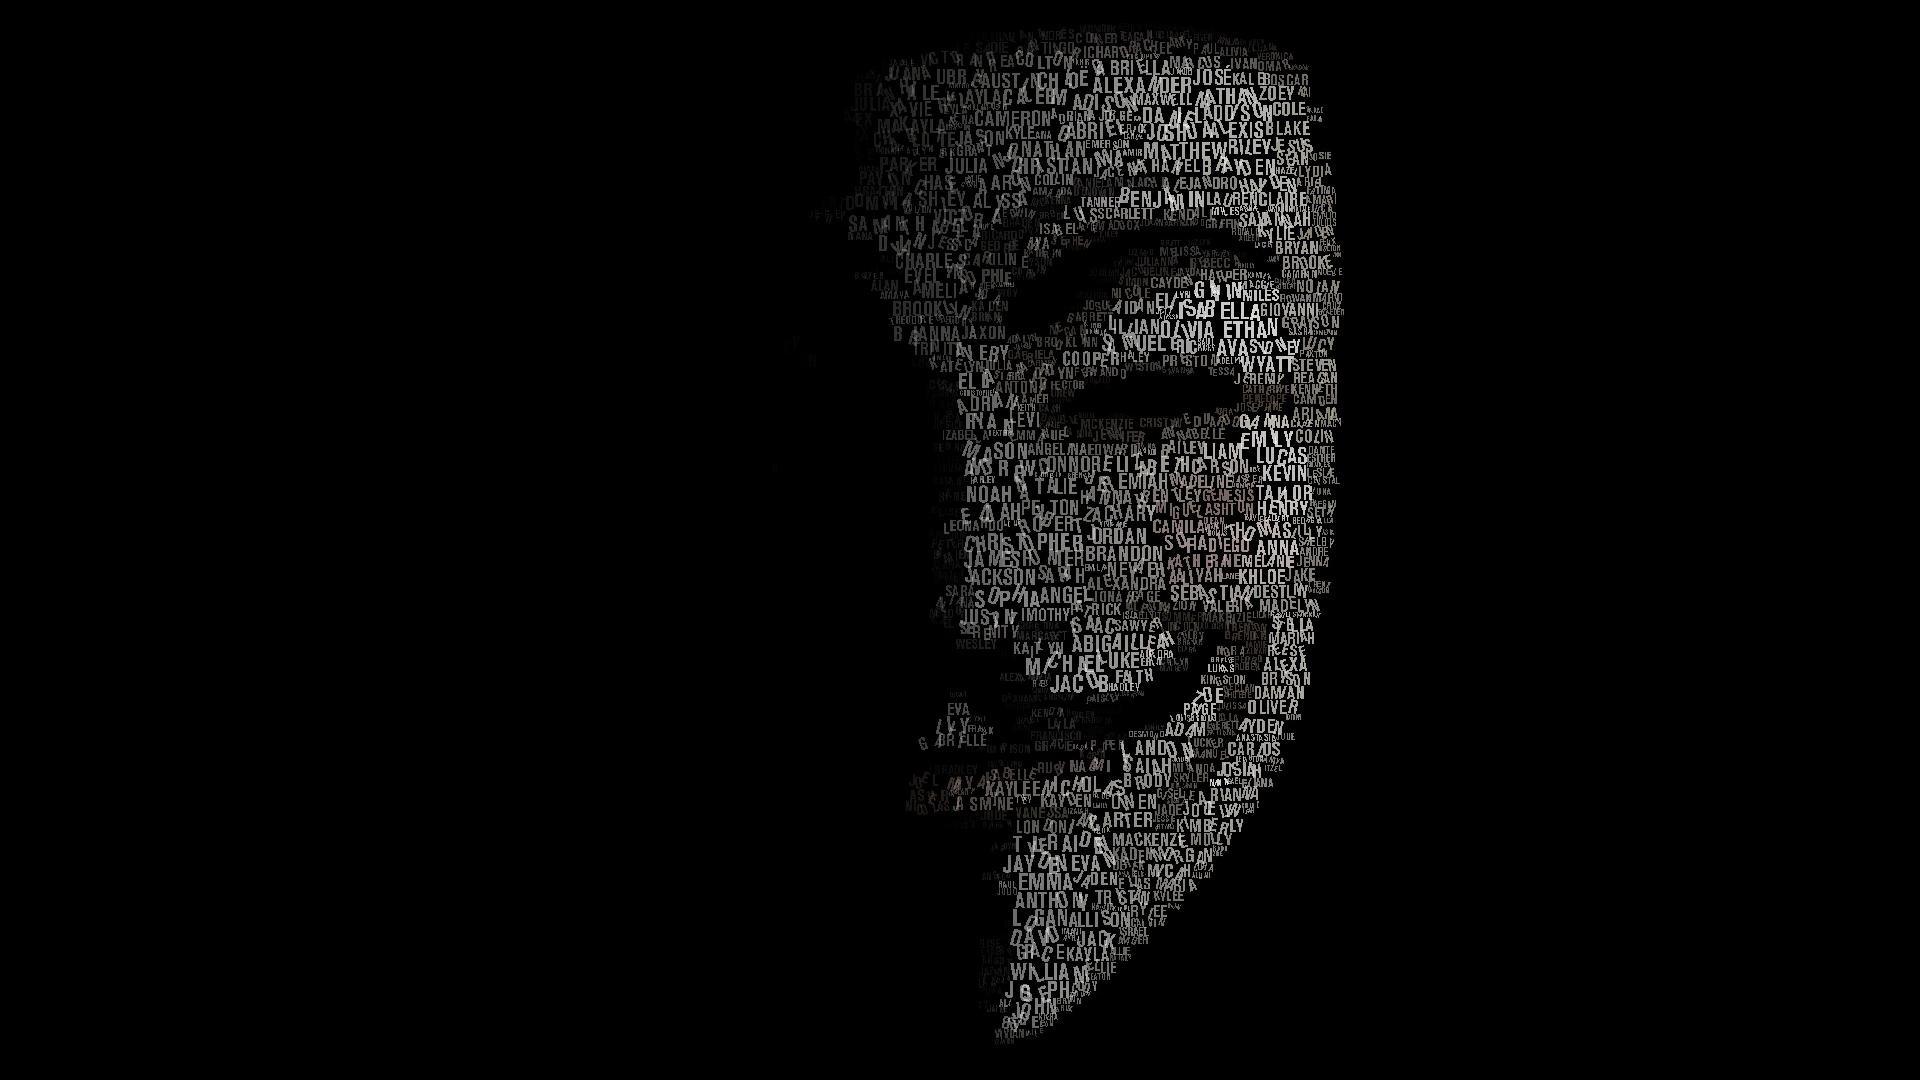 Anonieme kwaadwillende SEO